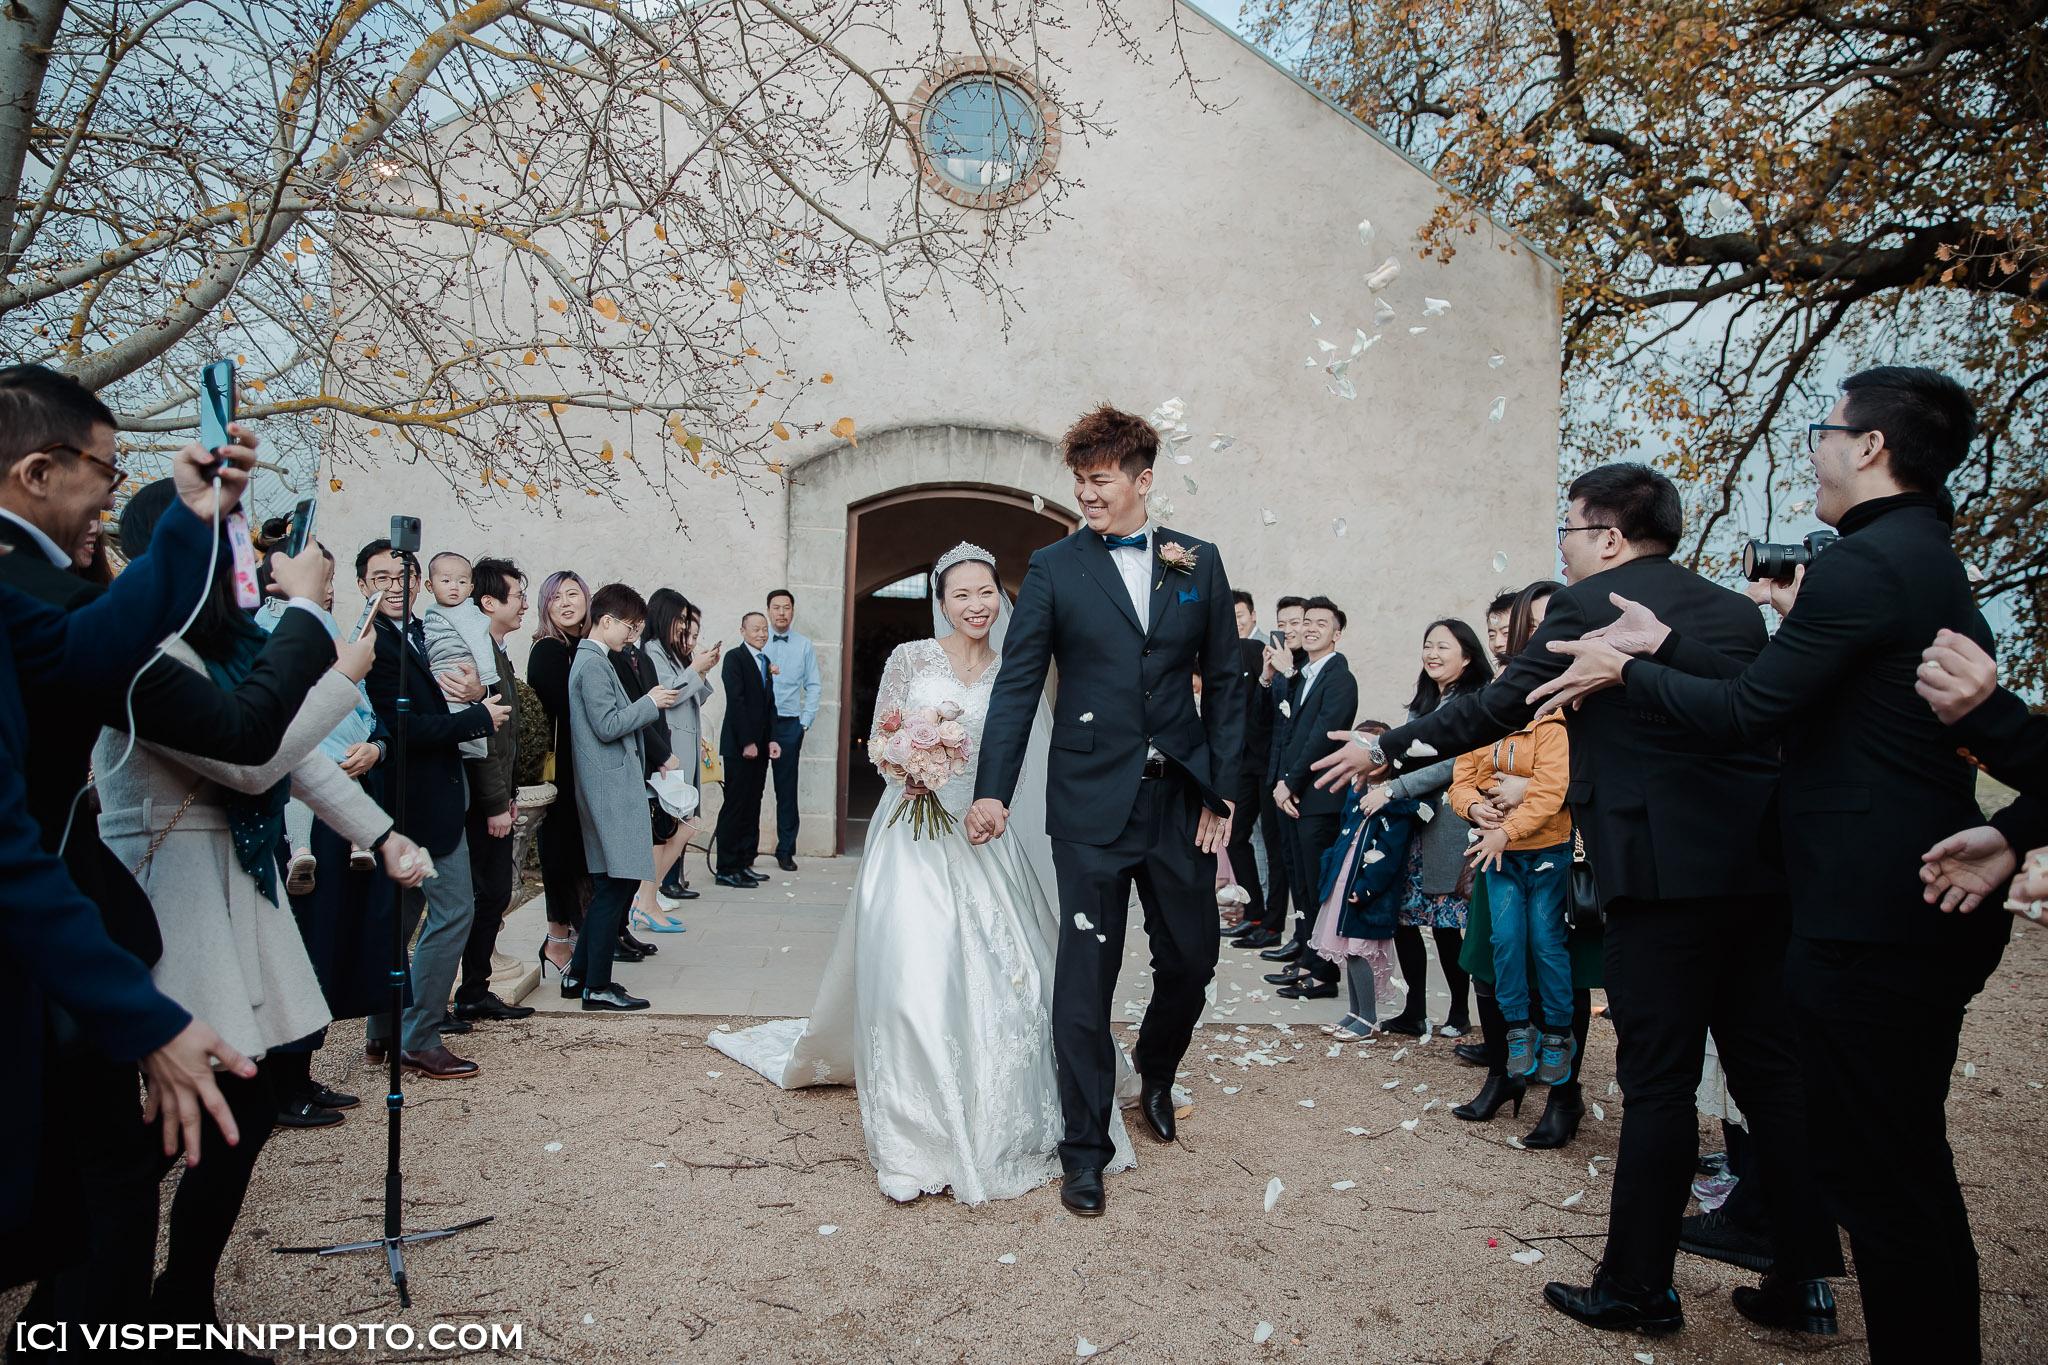 WEDDING DAY Photography Melbourne VISPENN 墨尔本 婚礼跟拍 婚礼摄像 婚礼摄影 结婚照 登记照 CoreyCoco 3P 08704 1DX VISPENN